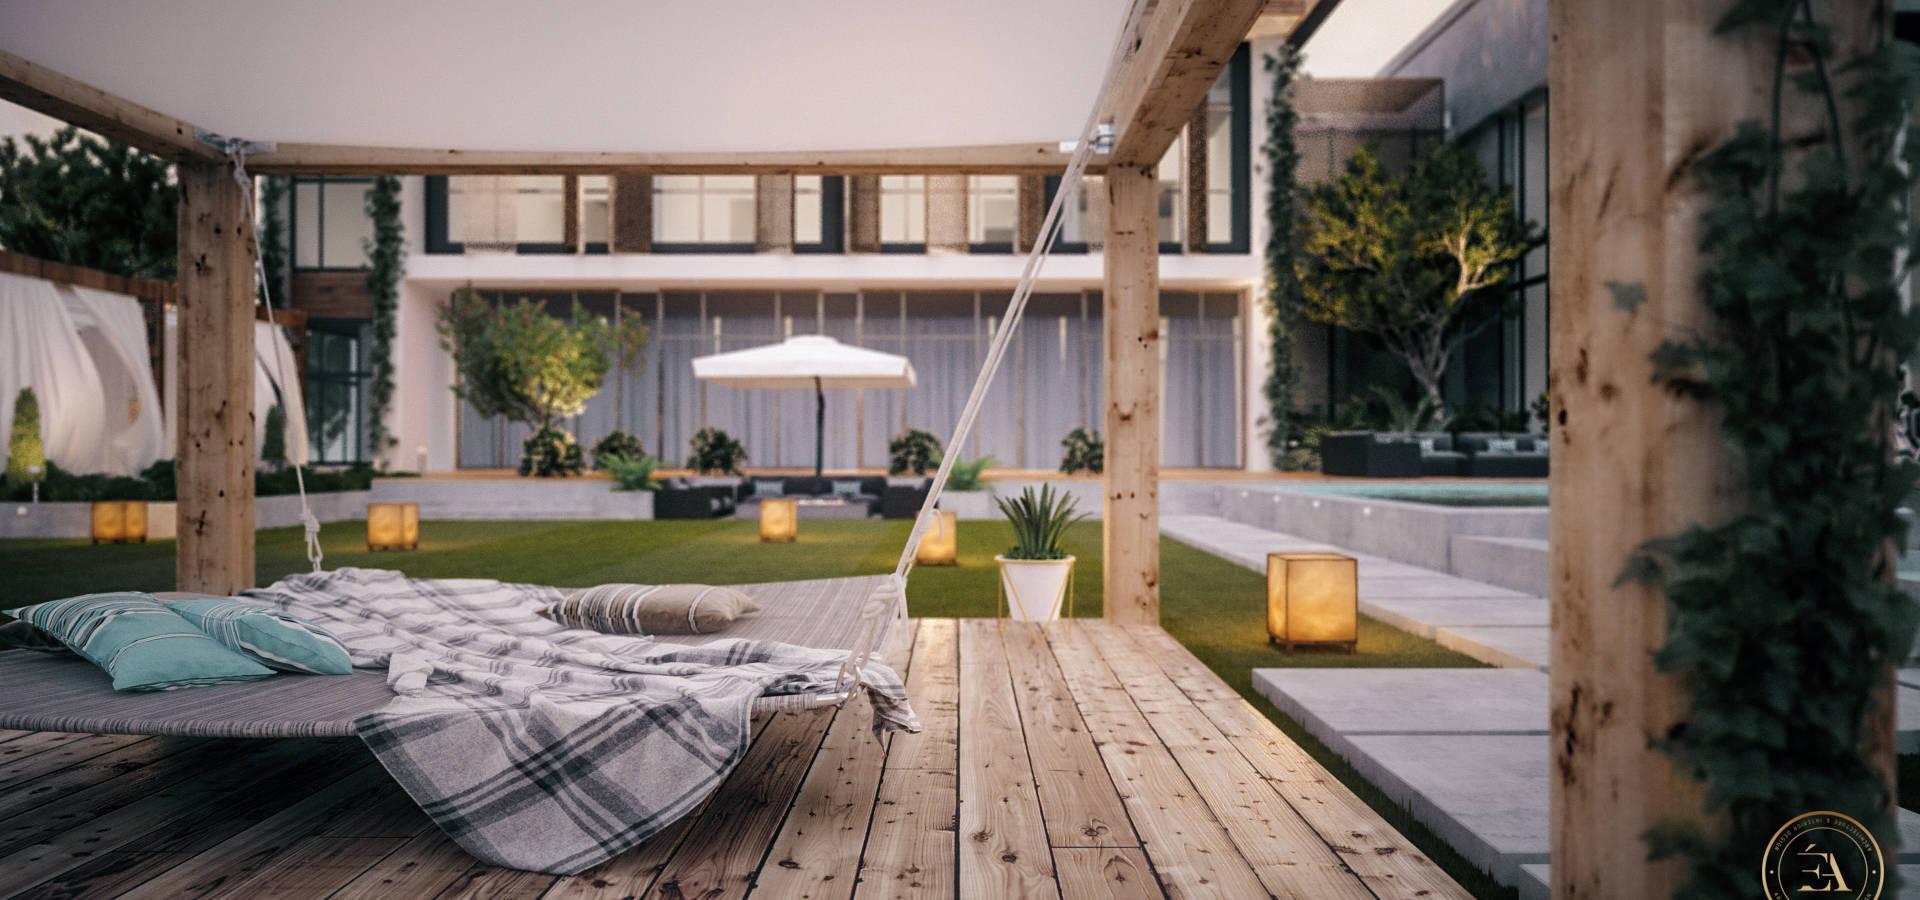 Echelle Architects